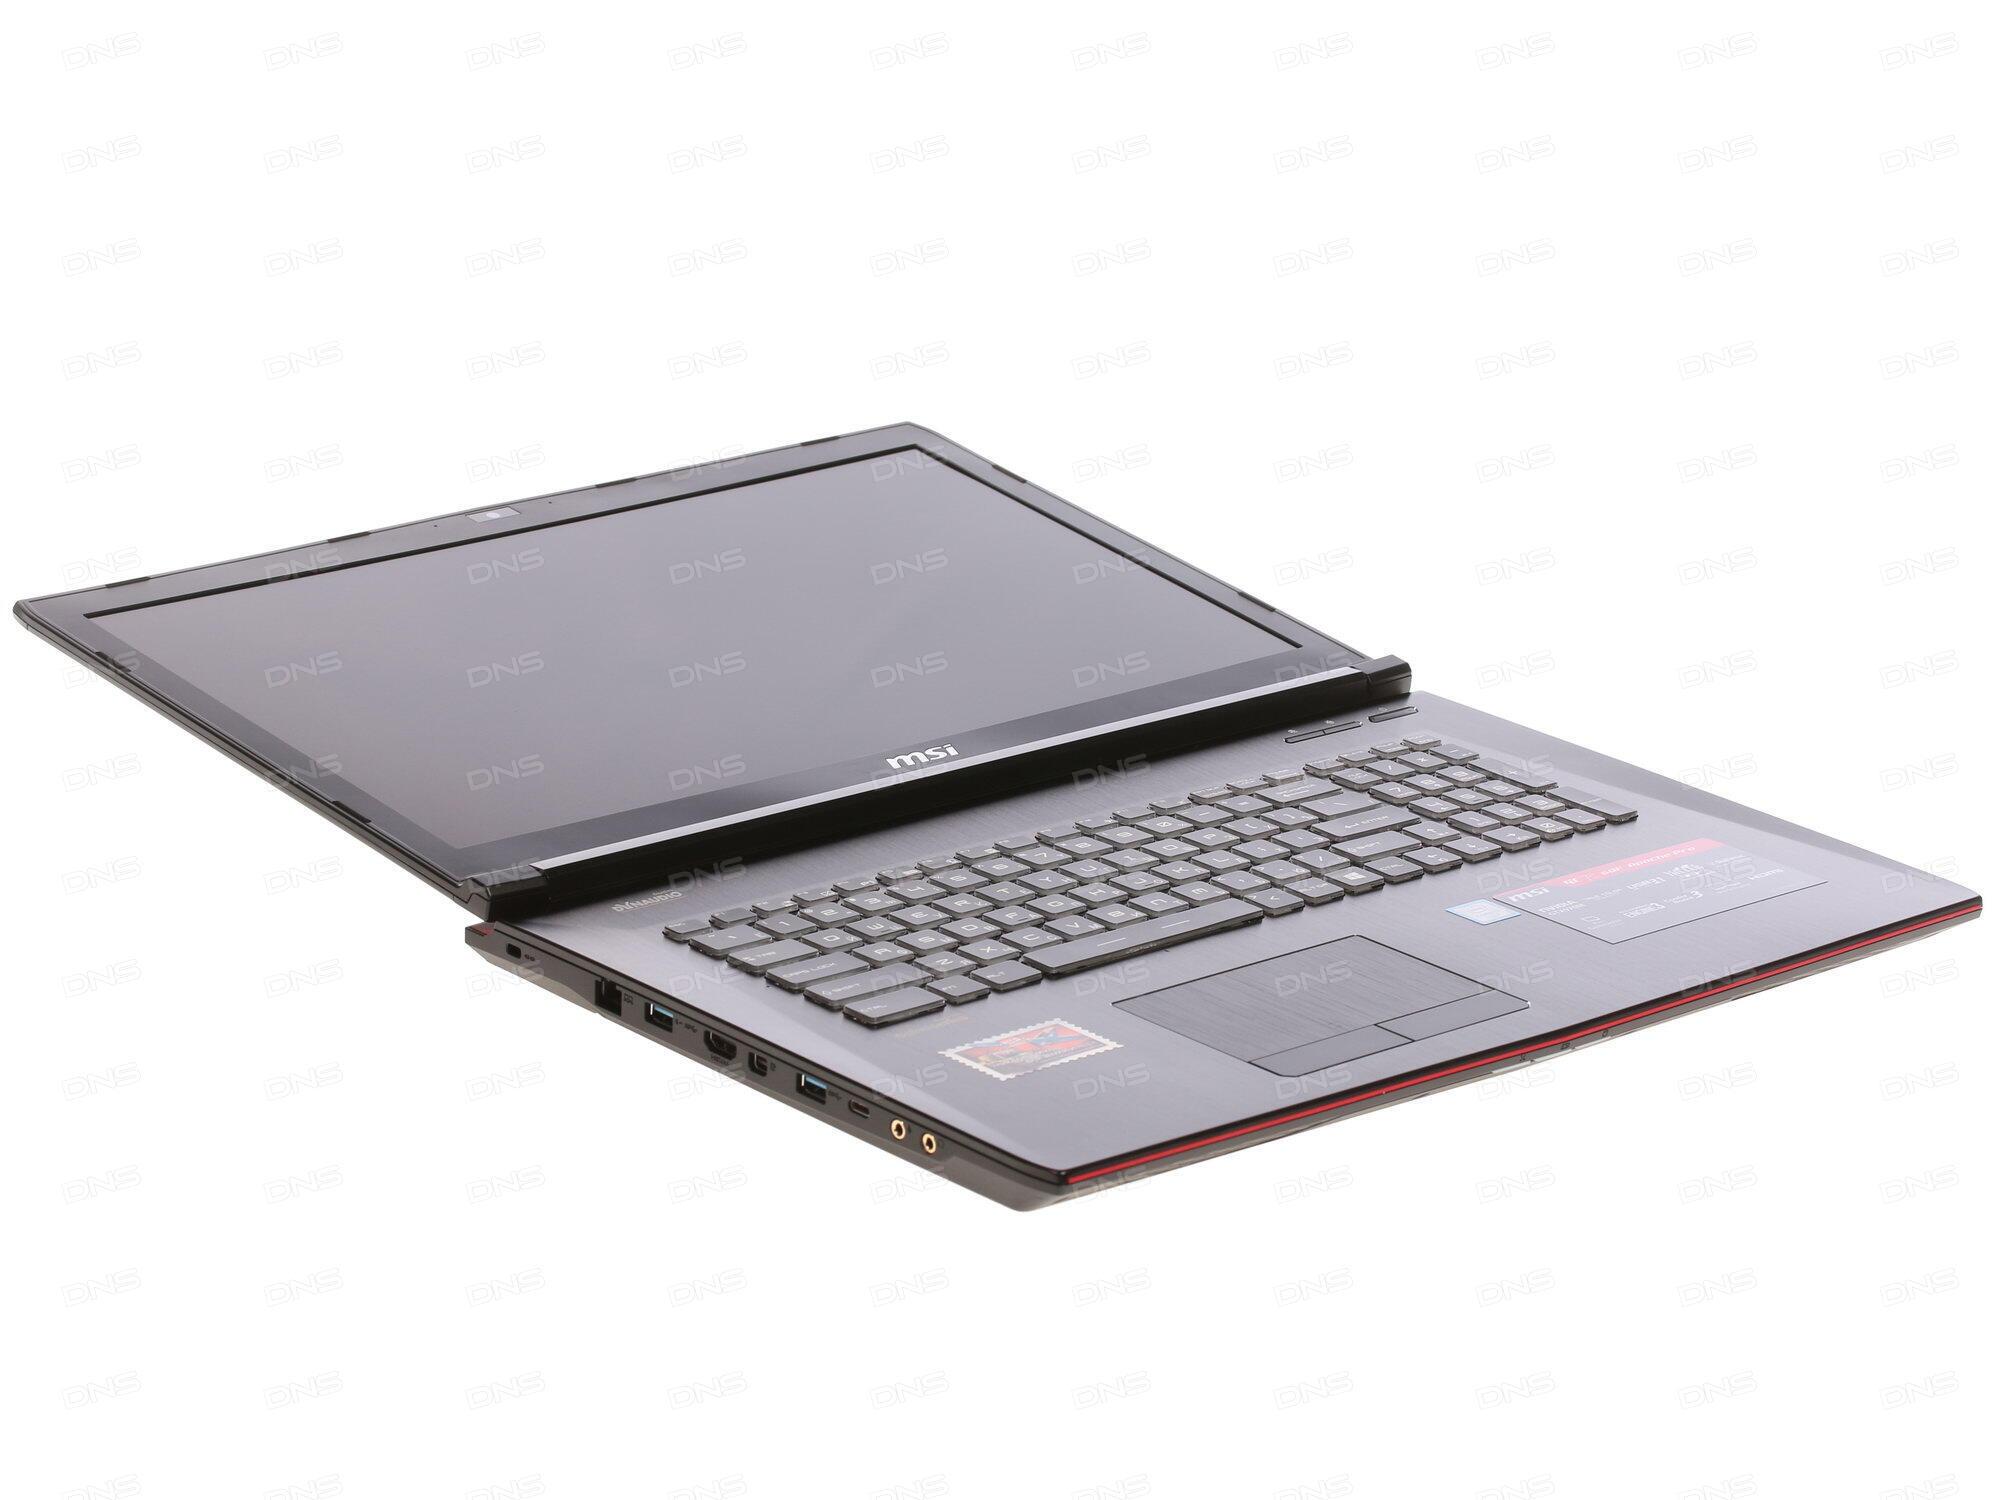 Ноутбук MSI GE72 2QE-031RU 9S7-179111-031 (Intel Core i7-4720HQ 2.6 GHz/8192Mb/1000Gb/DVD-RW/nVidia GeForce GTX 965M 2048Mb/Wi-Fi/Cam/17.3/1920x1080/Windows 8 64-bit)